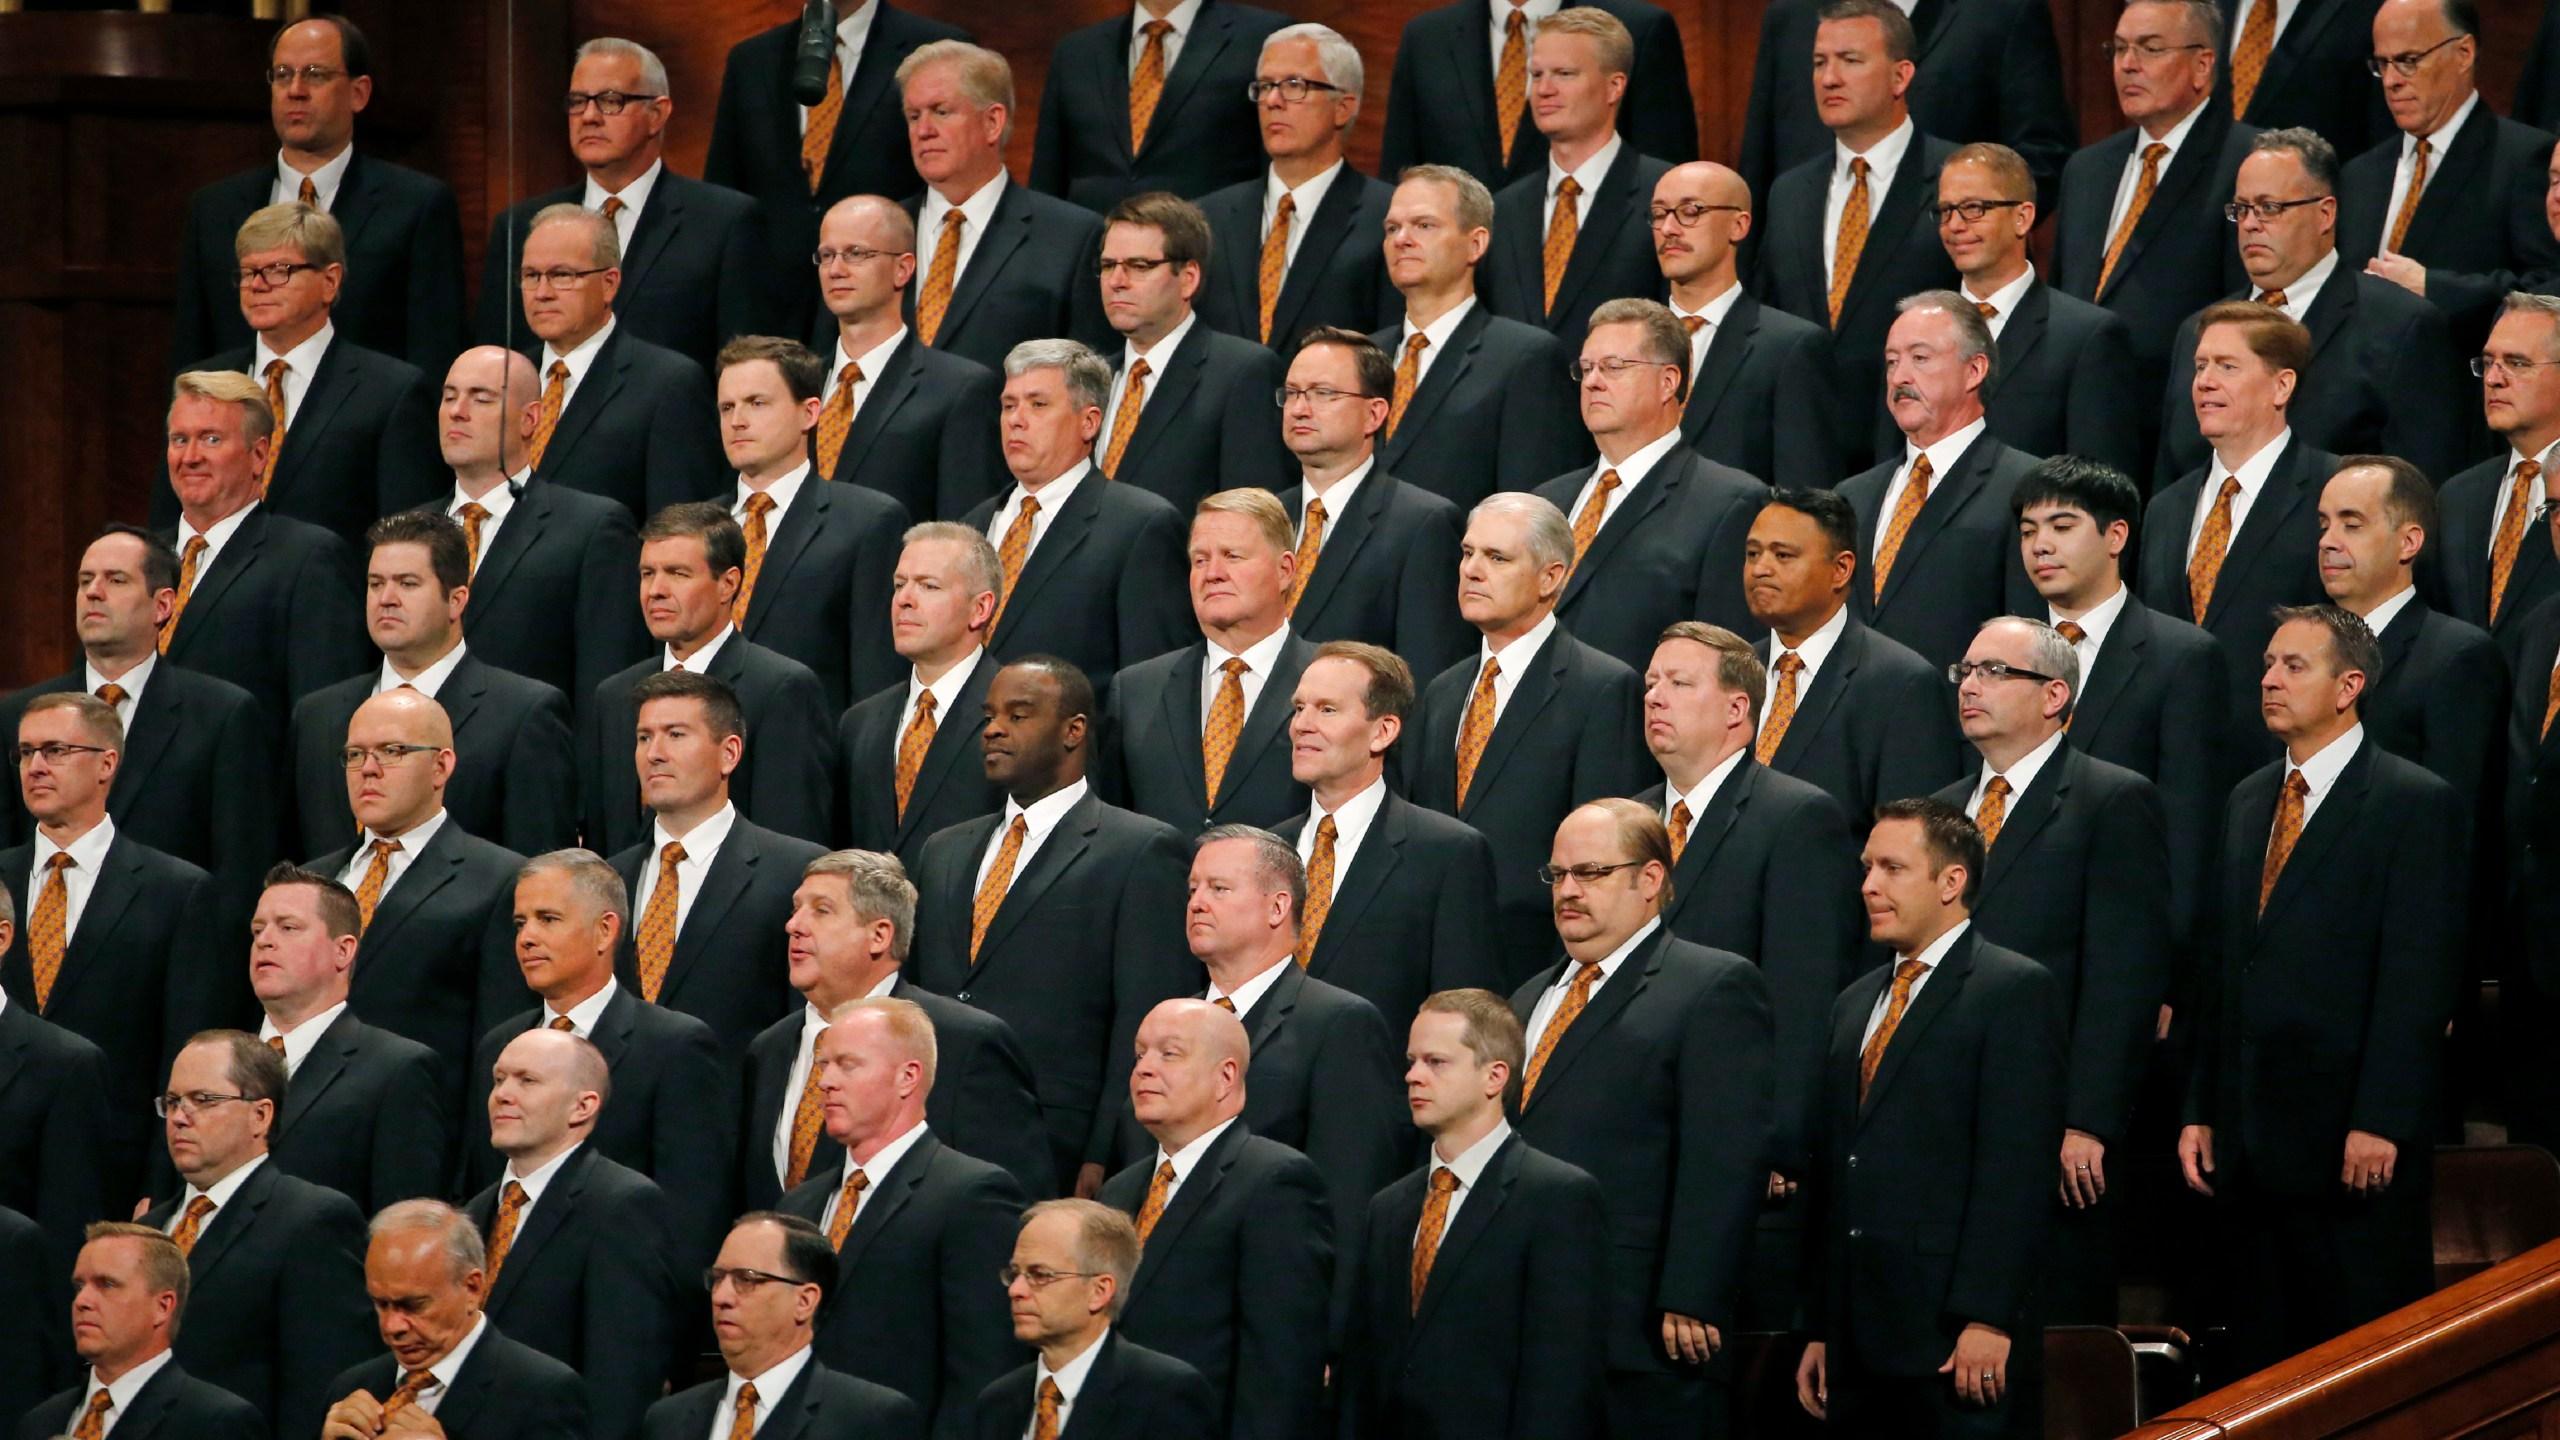 Christmas Music Tours Buffalo 2020 Mormon choir Christmas concert cancelled due to pandemic   News 4